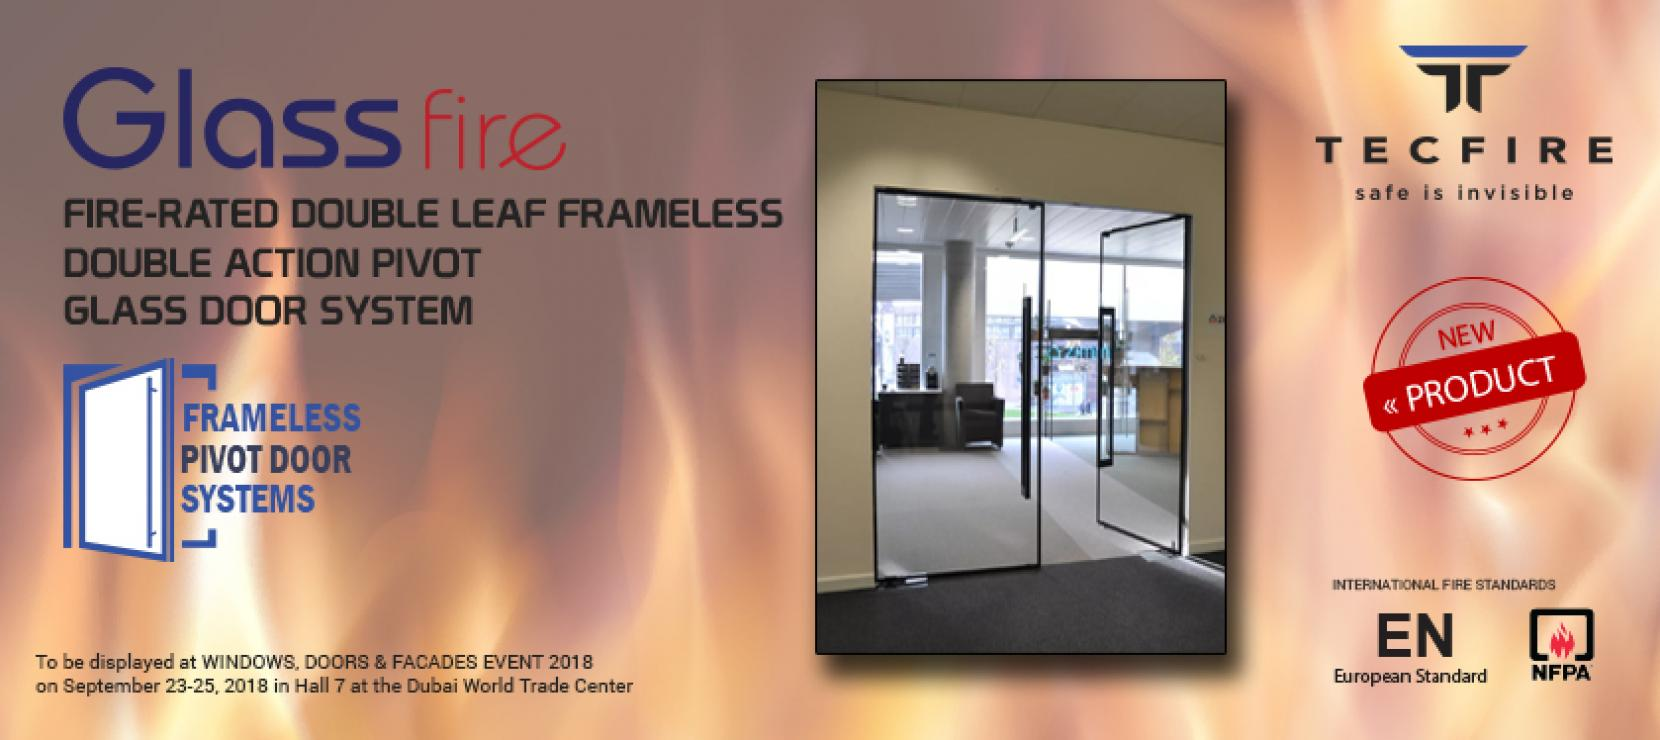 Tecfire's Pivot Door Systems